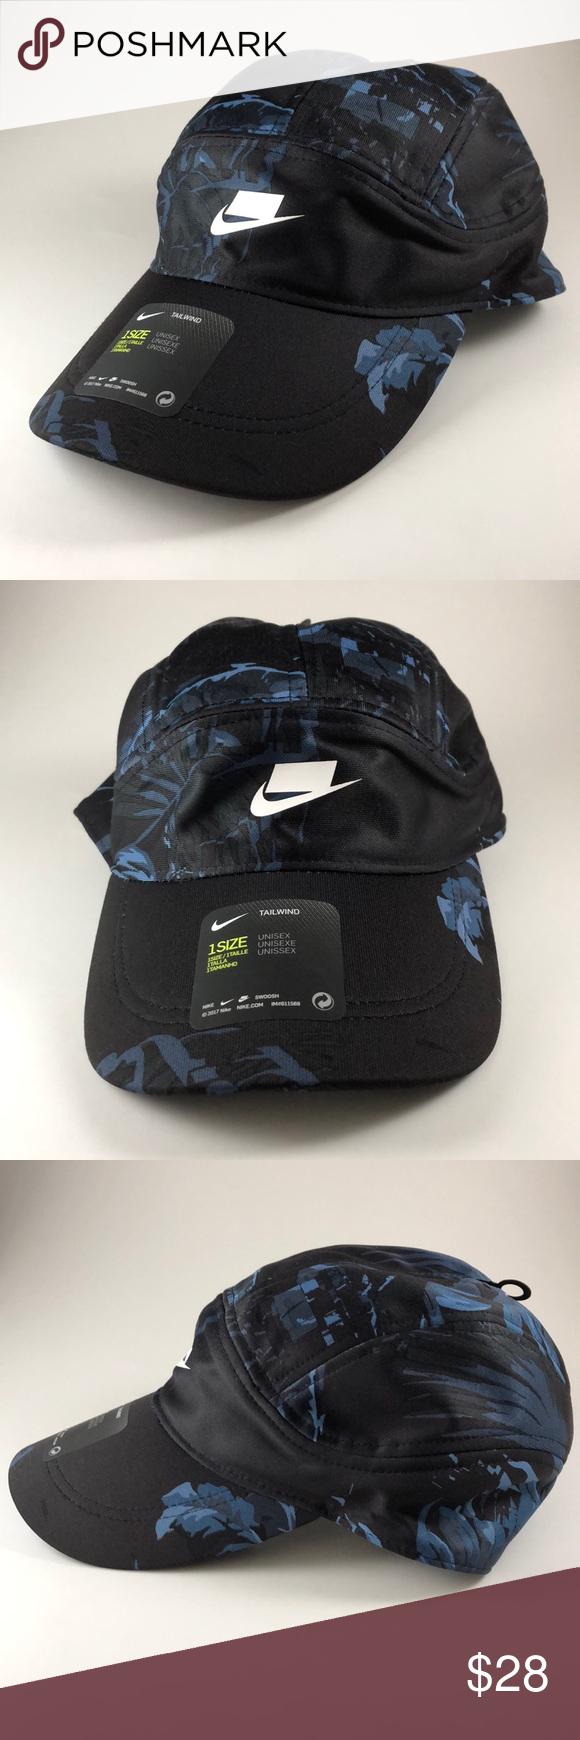 Nike Tailwind Floral Adjustable Cap Nike Tailwind Adjustable Cap Nike